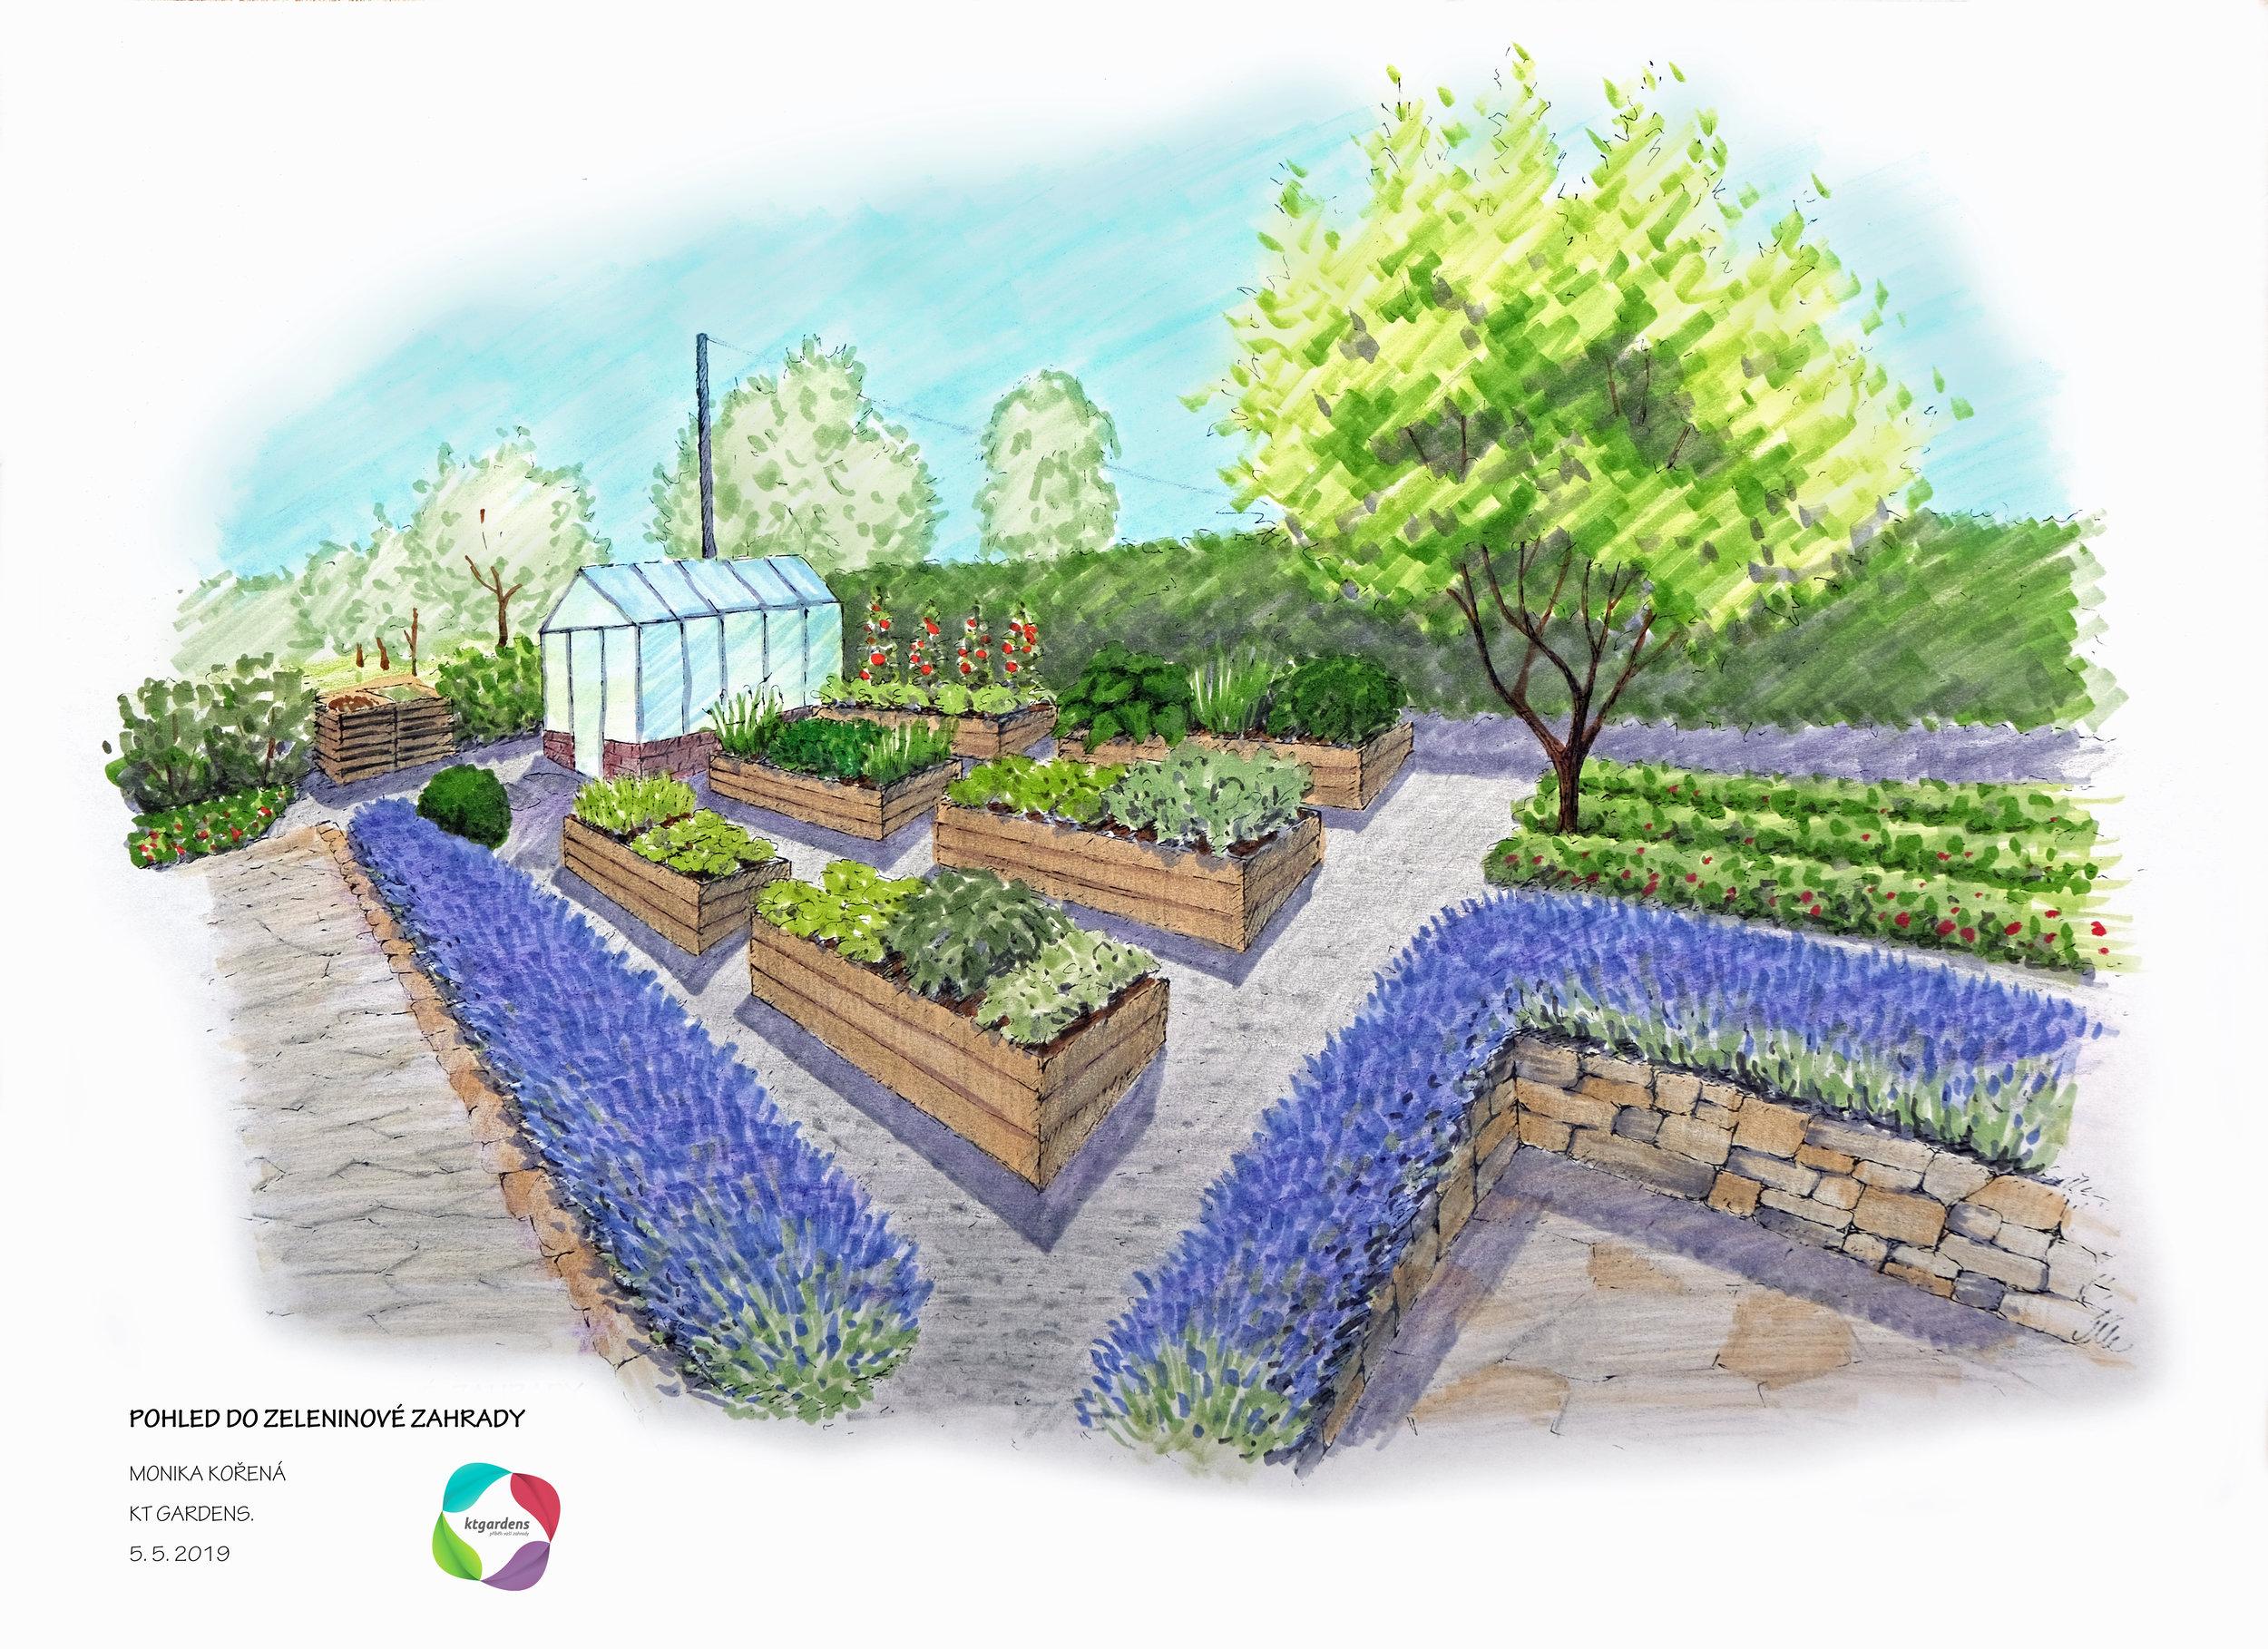 Návrh zahrady v Čeladné, venkovská zahrada, rodinná zahrada, trvalky, záhony, bylinky, zelenina, KTgardens